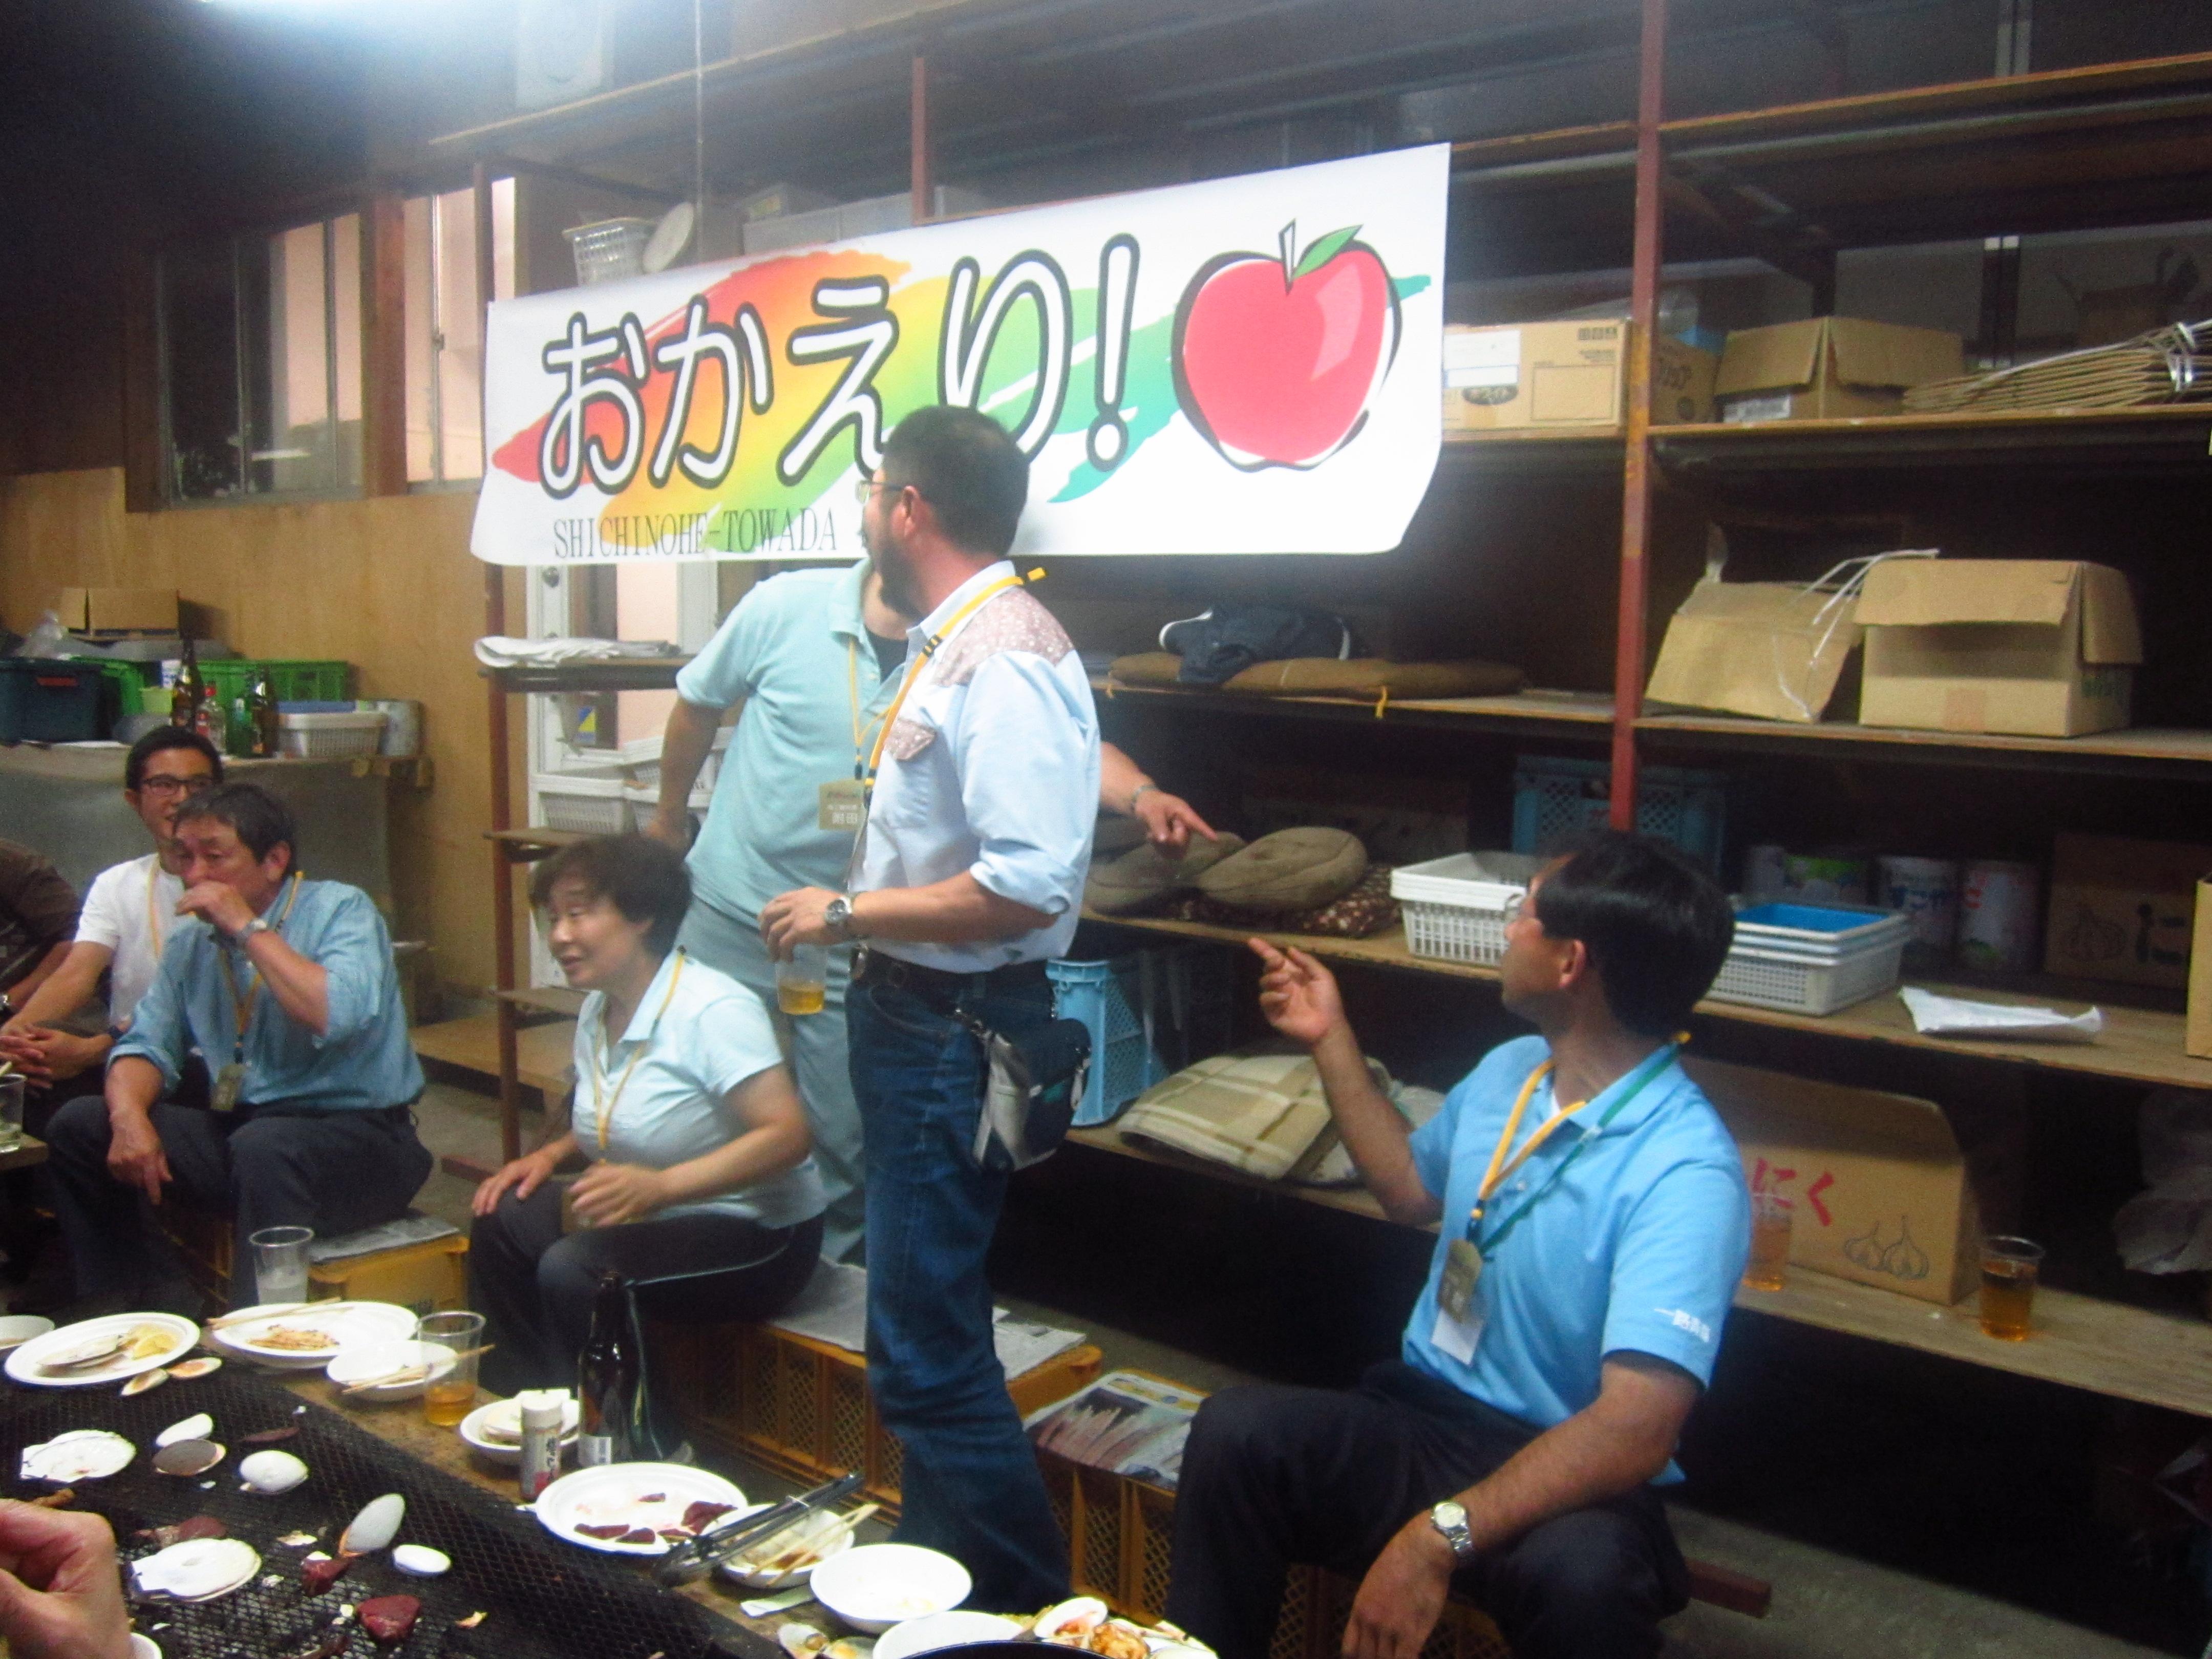 IMG 4422 - 麻布十番納涼祭り25,26日(七戸町出店)